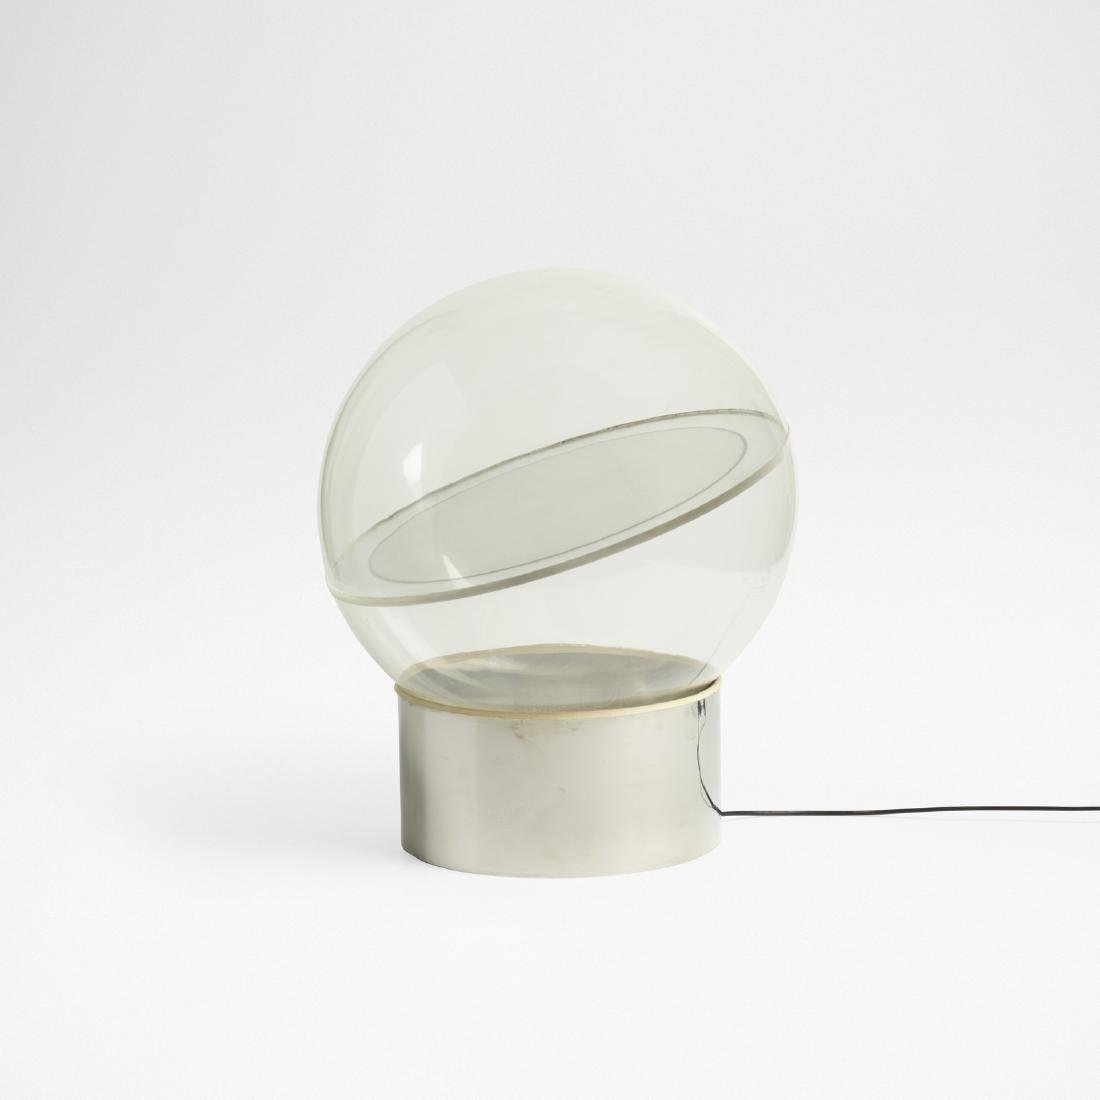 Filippo Panseca, table lamp, model 4043